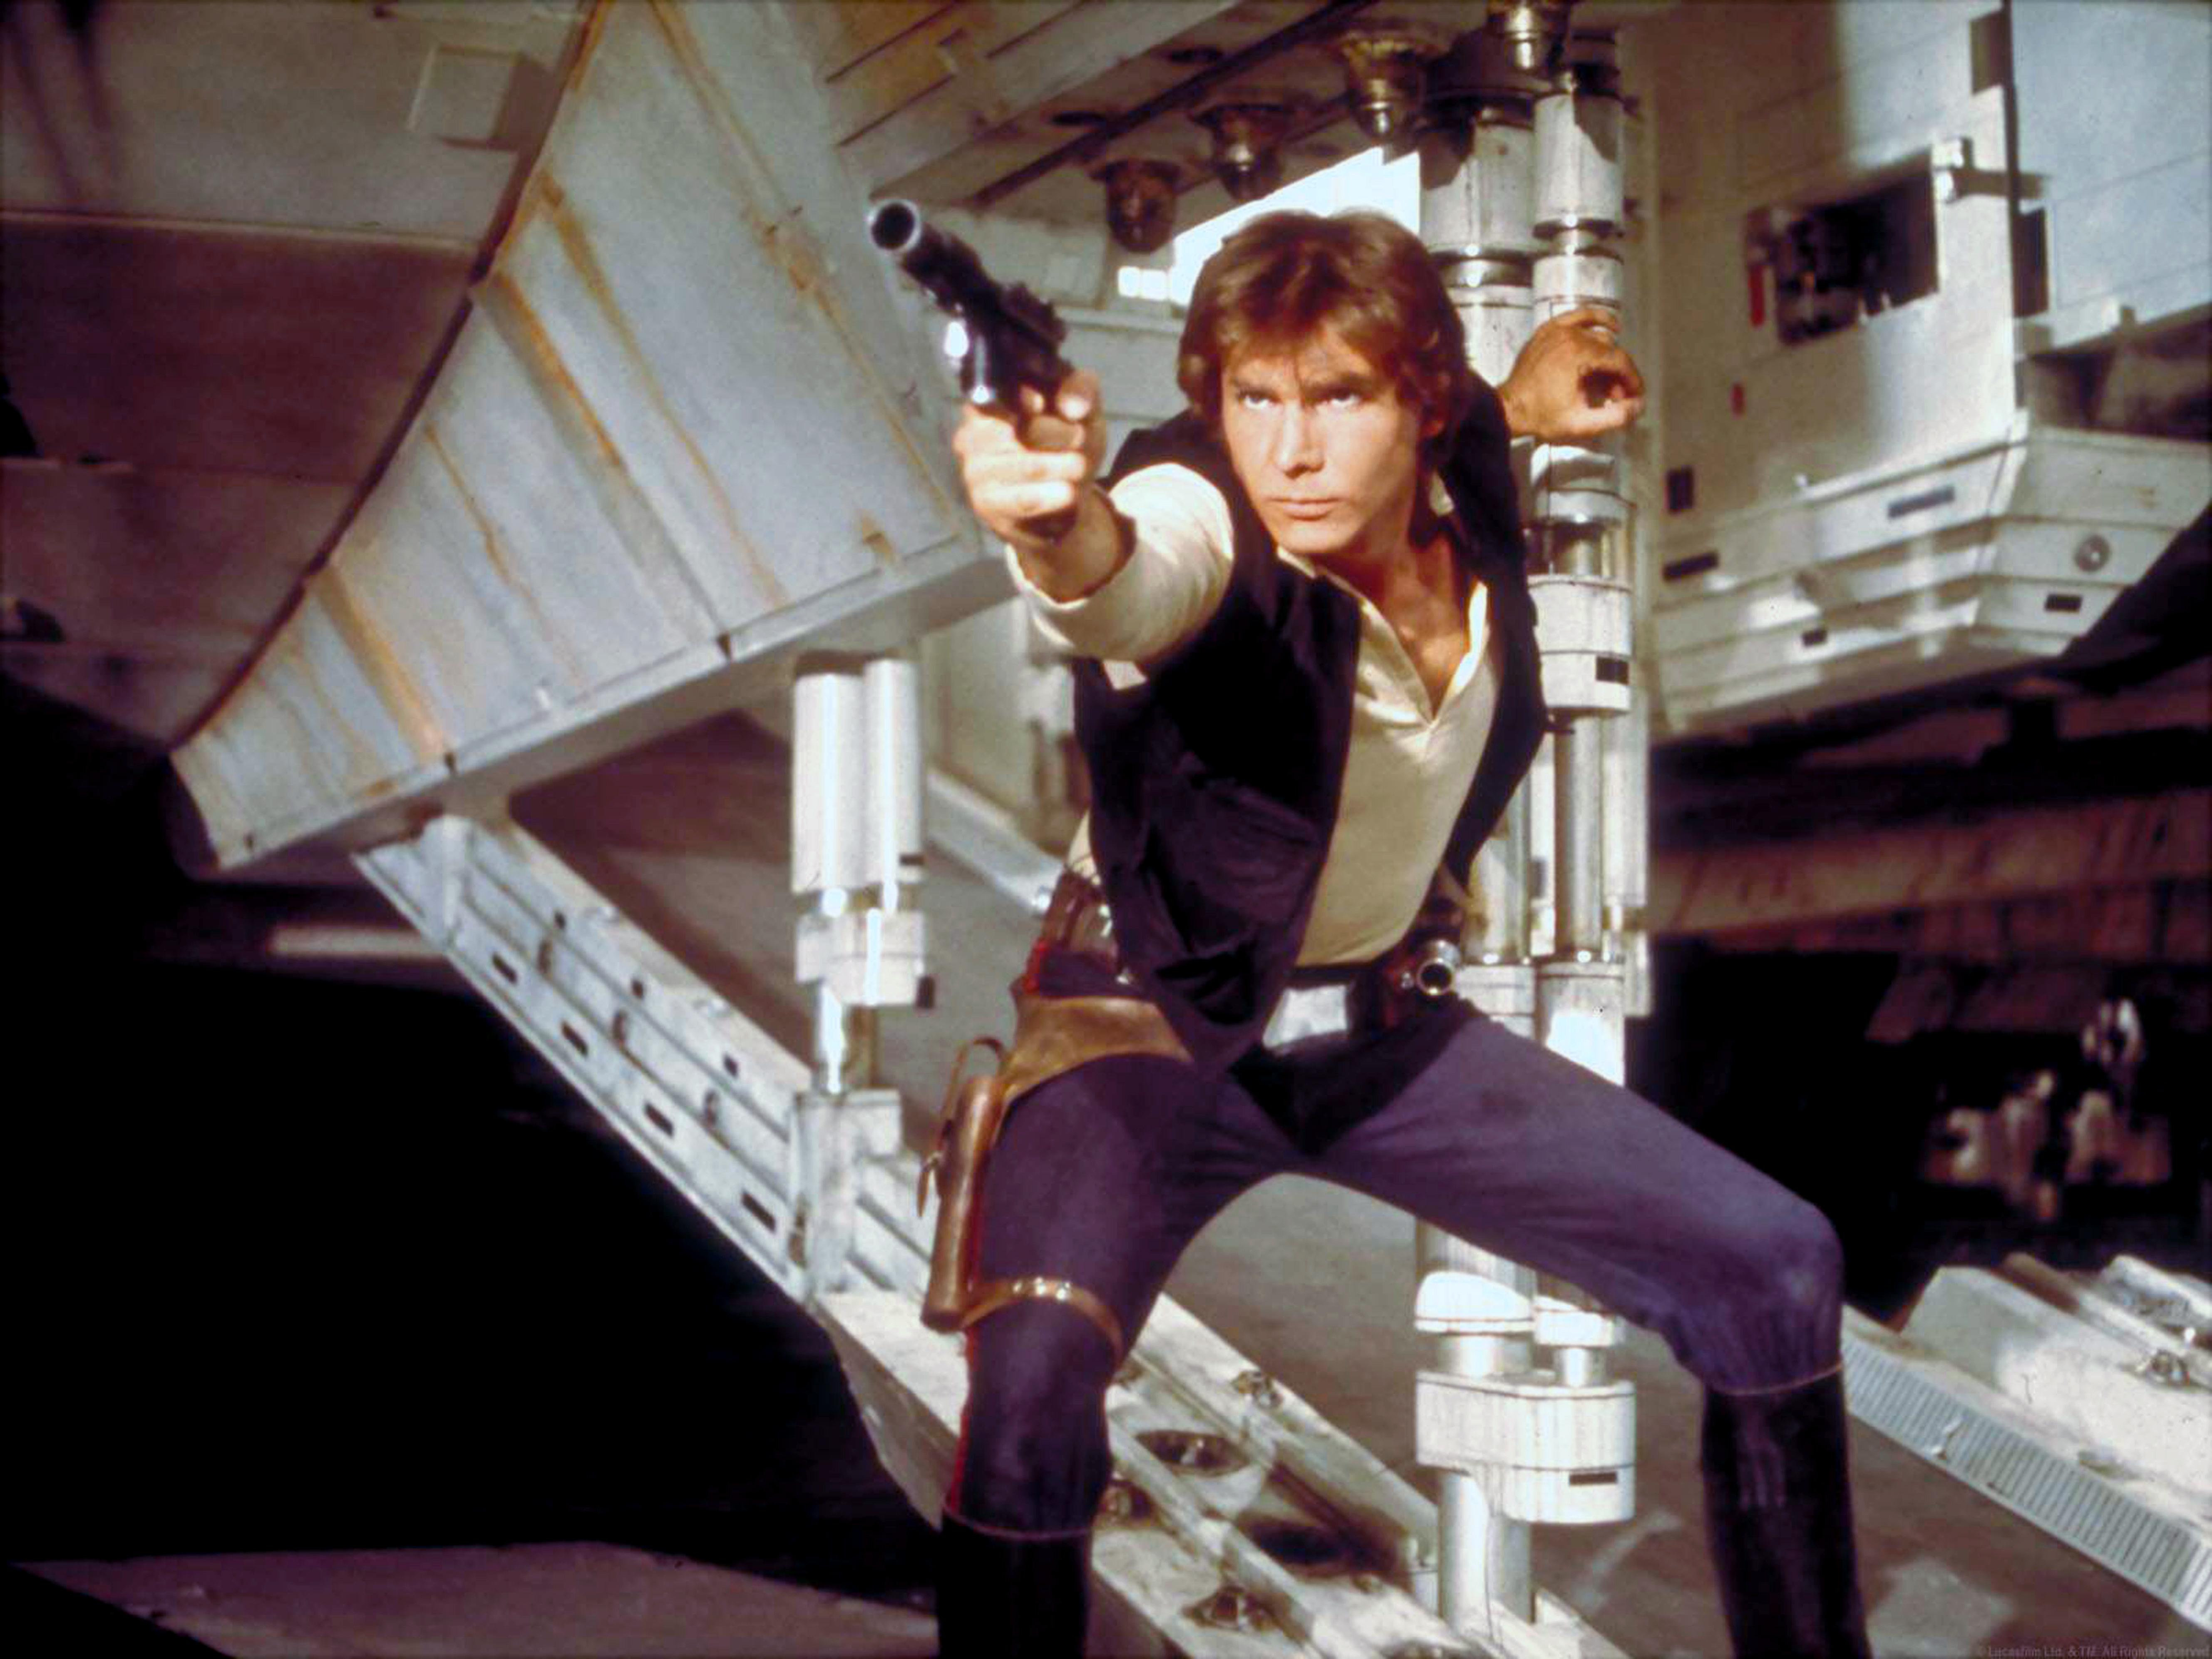 Han Solo goes solo